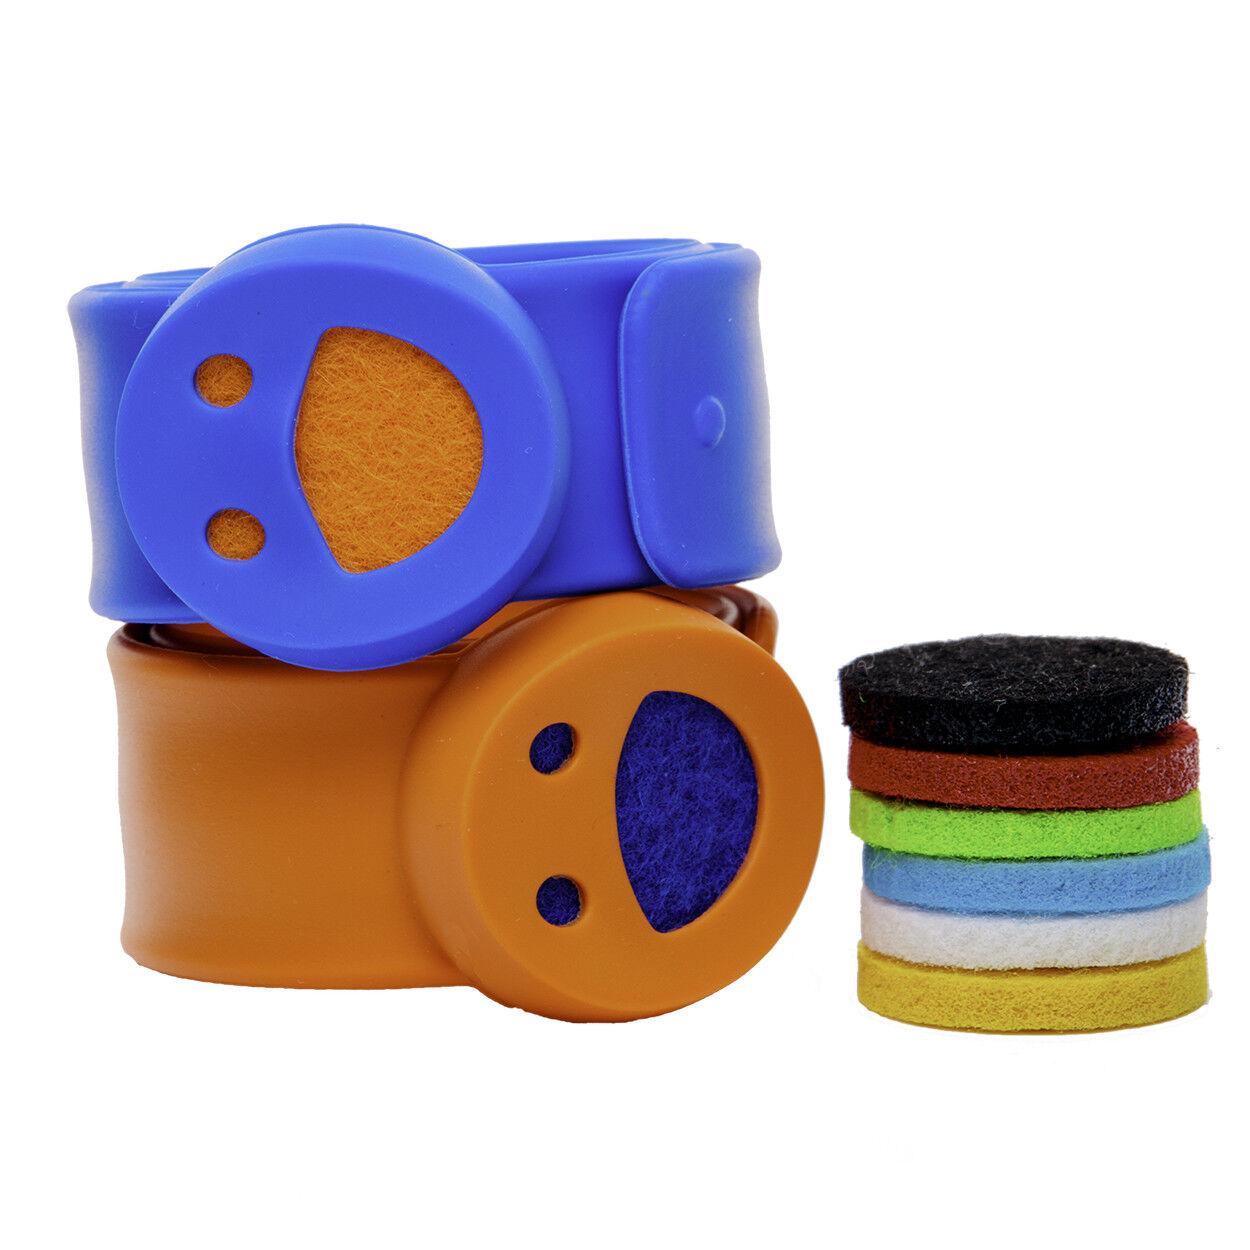 Kids Diffuser Bracelets - Set of 2 Essential Oil Bracelets w